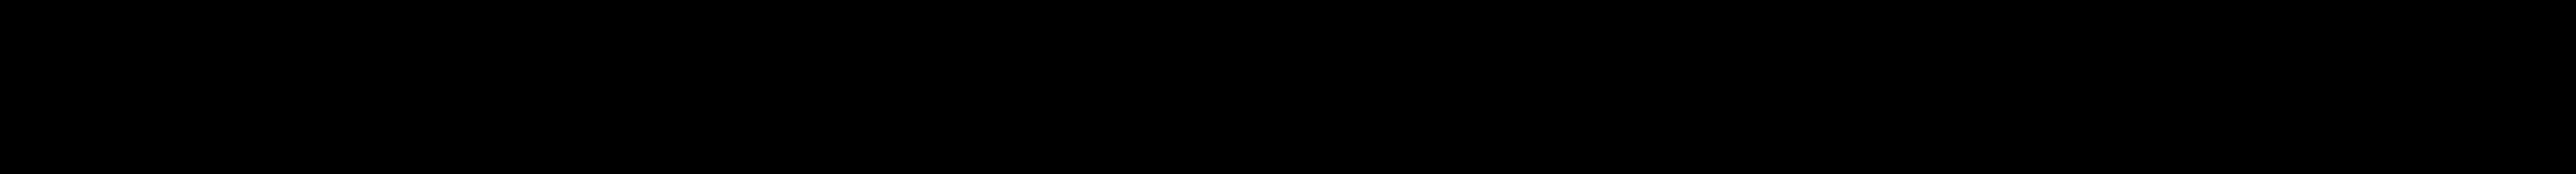 Copperplate Deco Sans Light